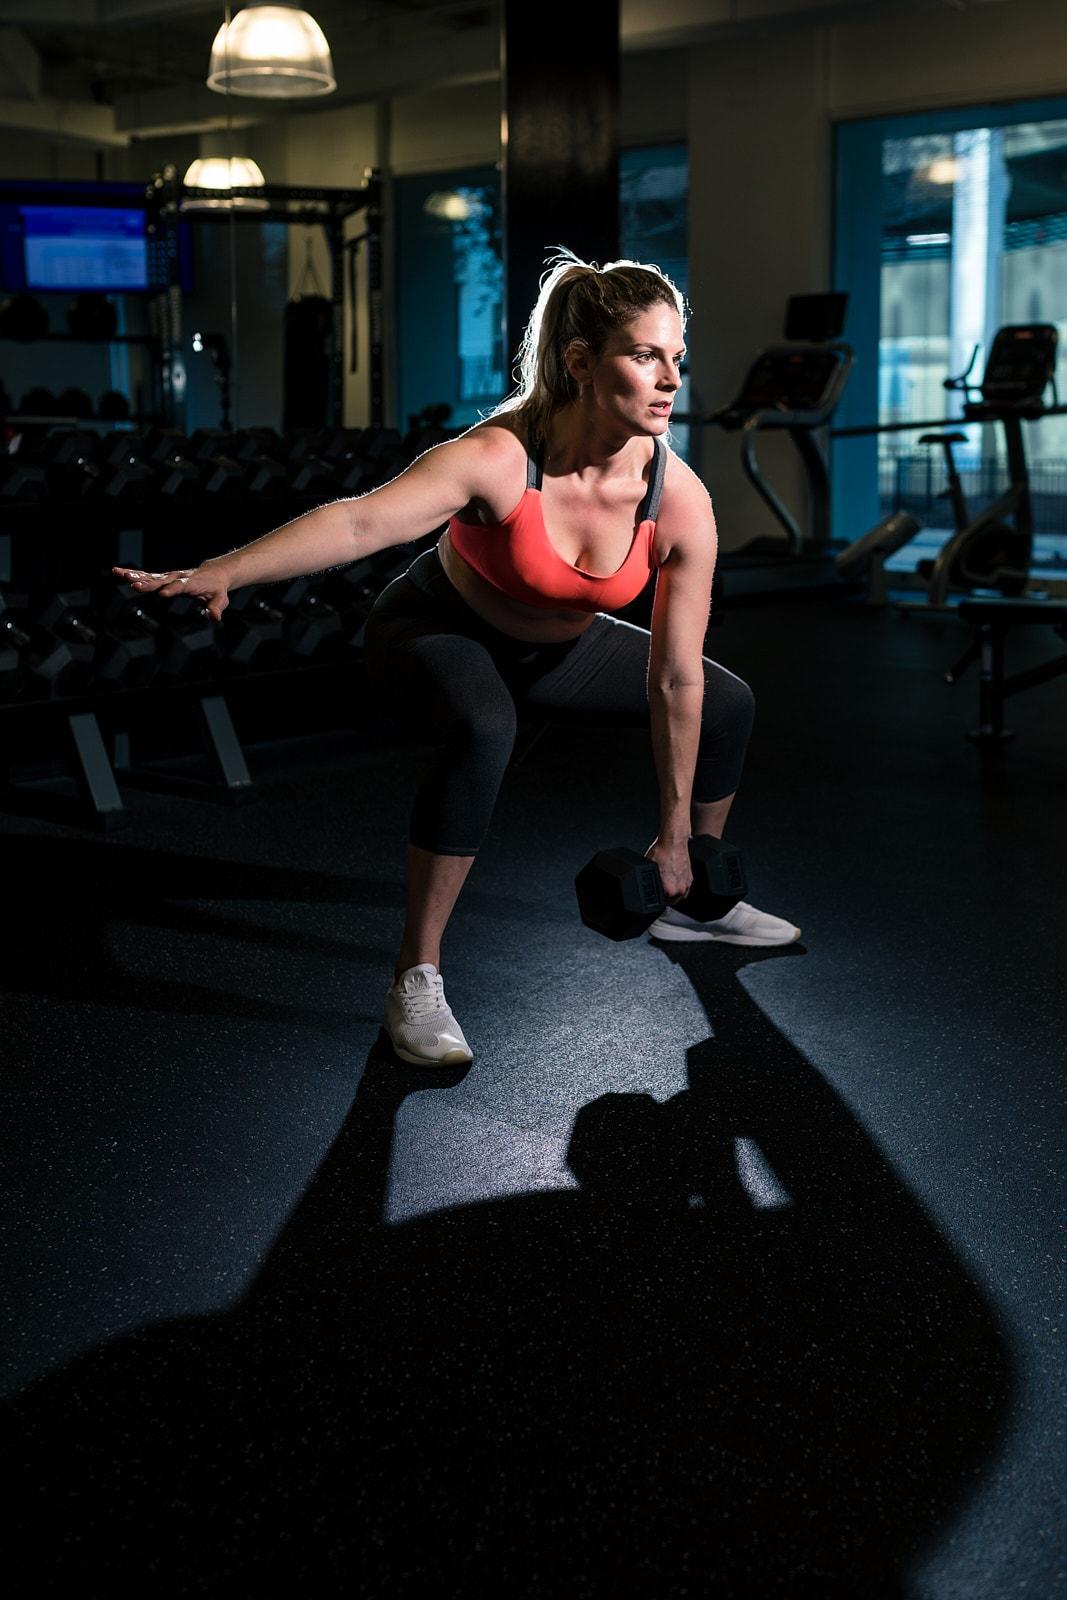 dramatic portrait of mom lifting weights in Atlanta gym